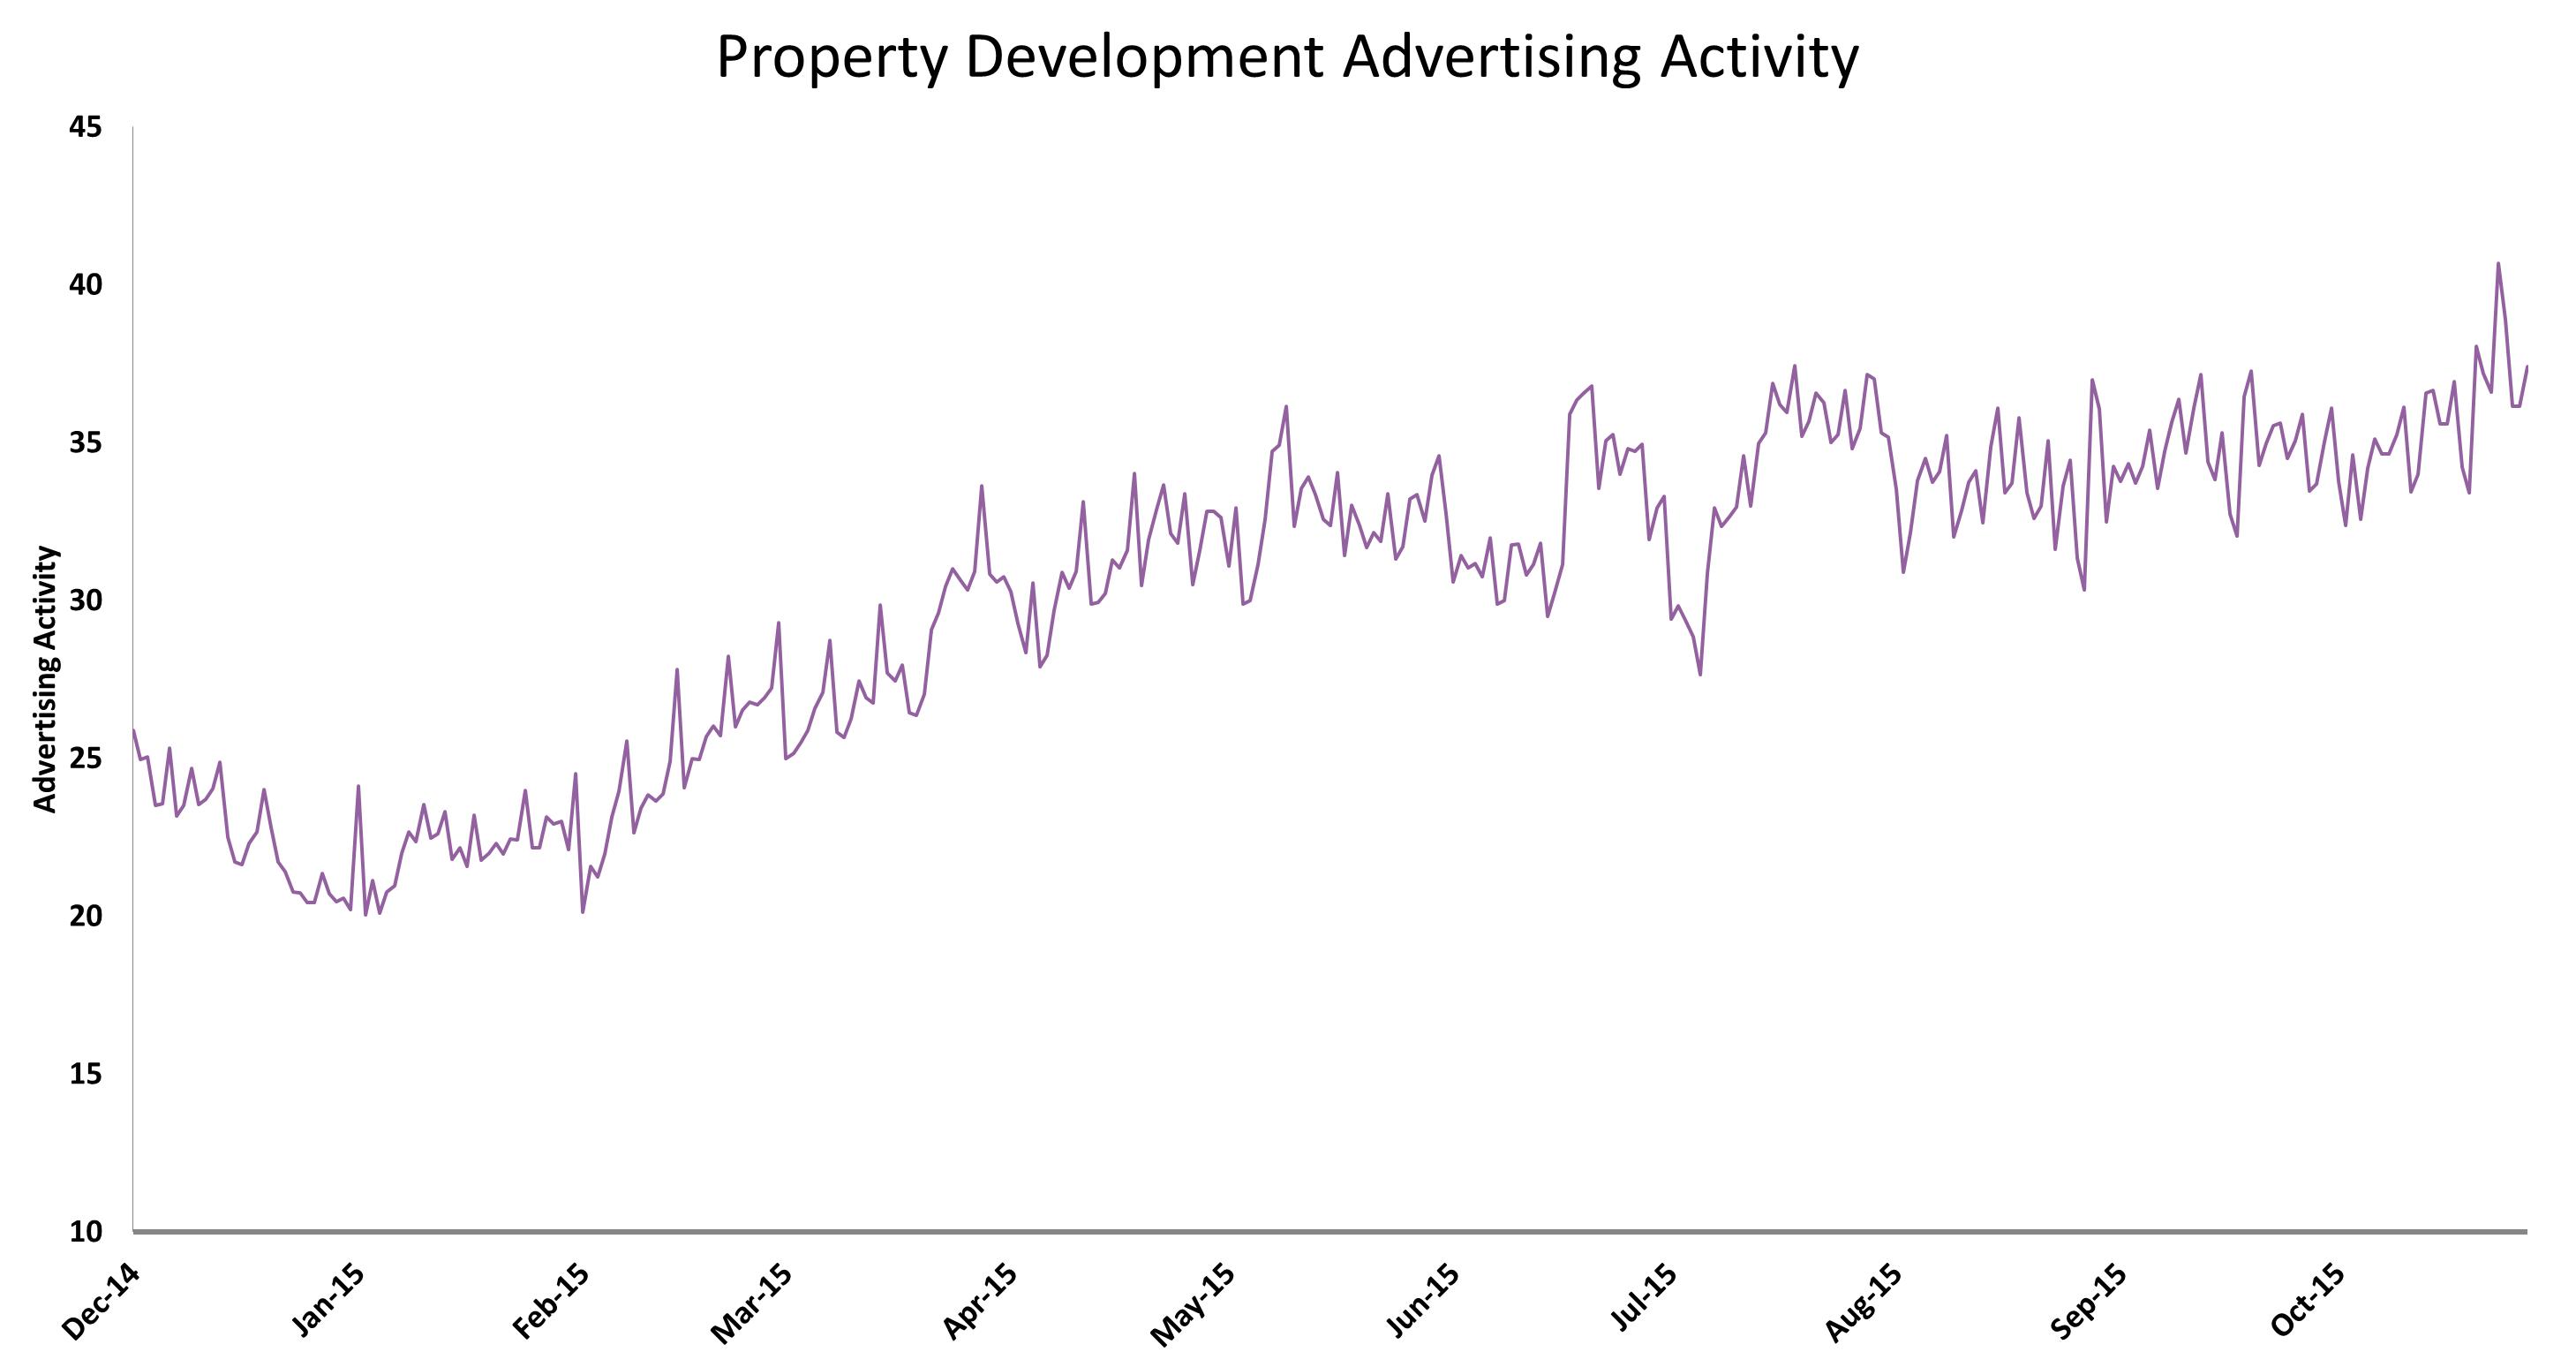 Property Development Advertising Activity